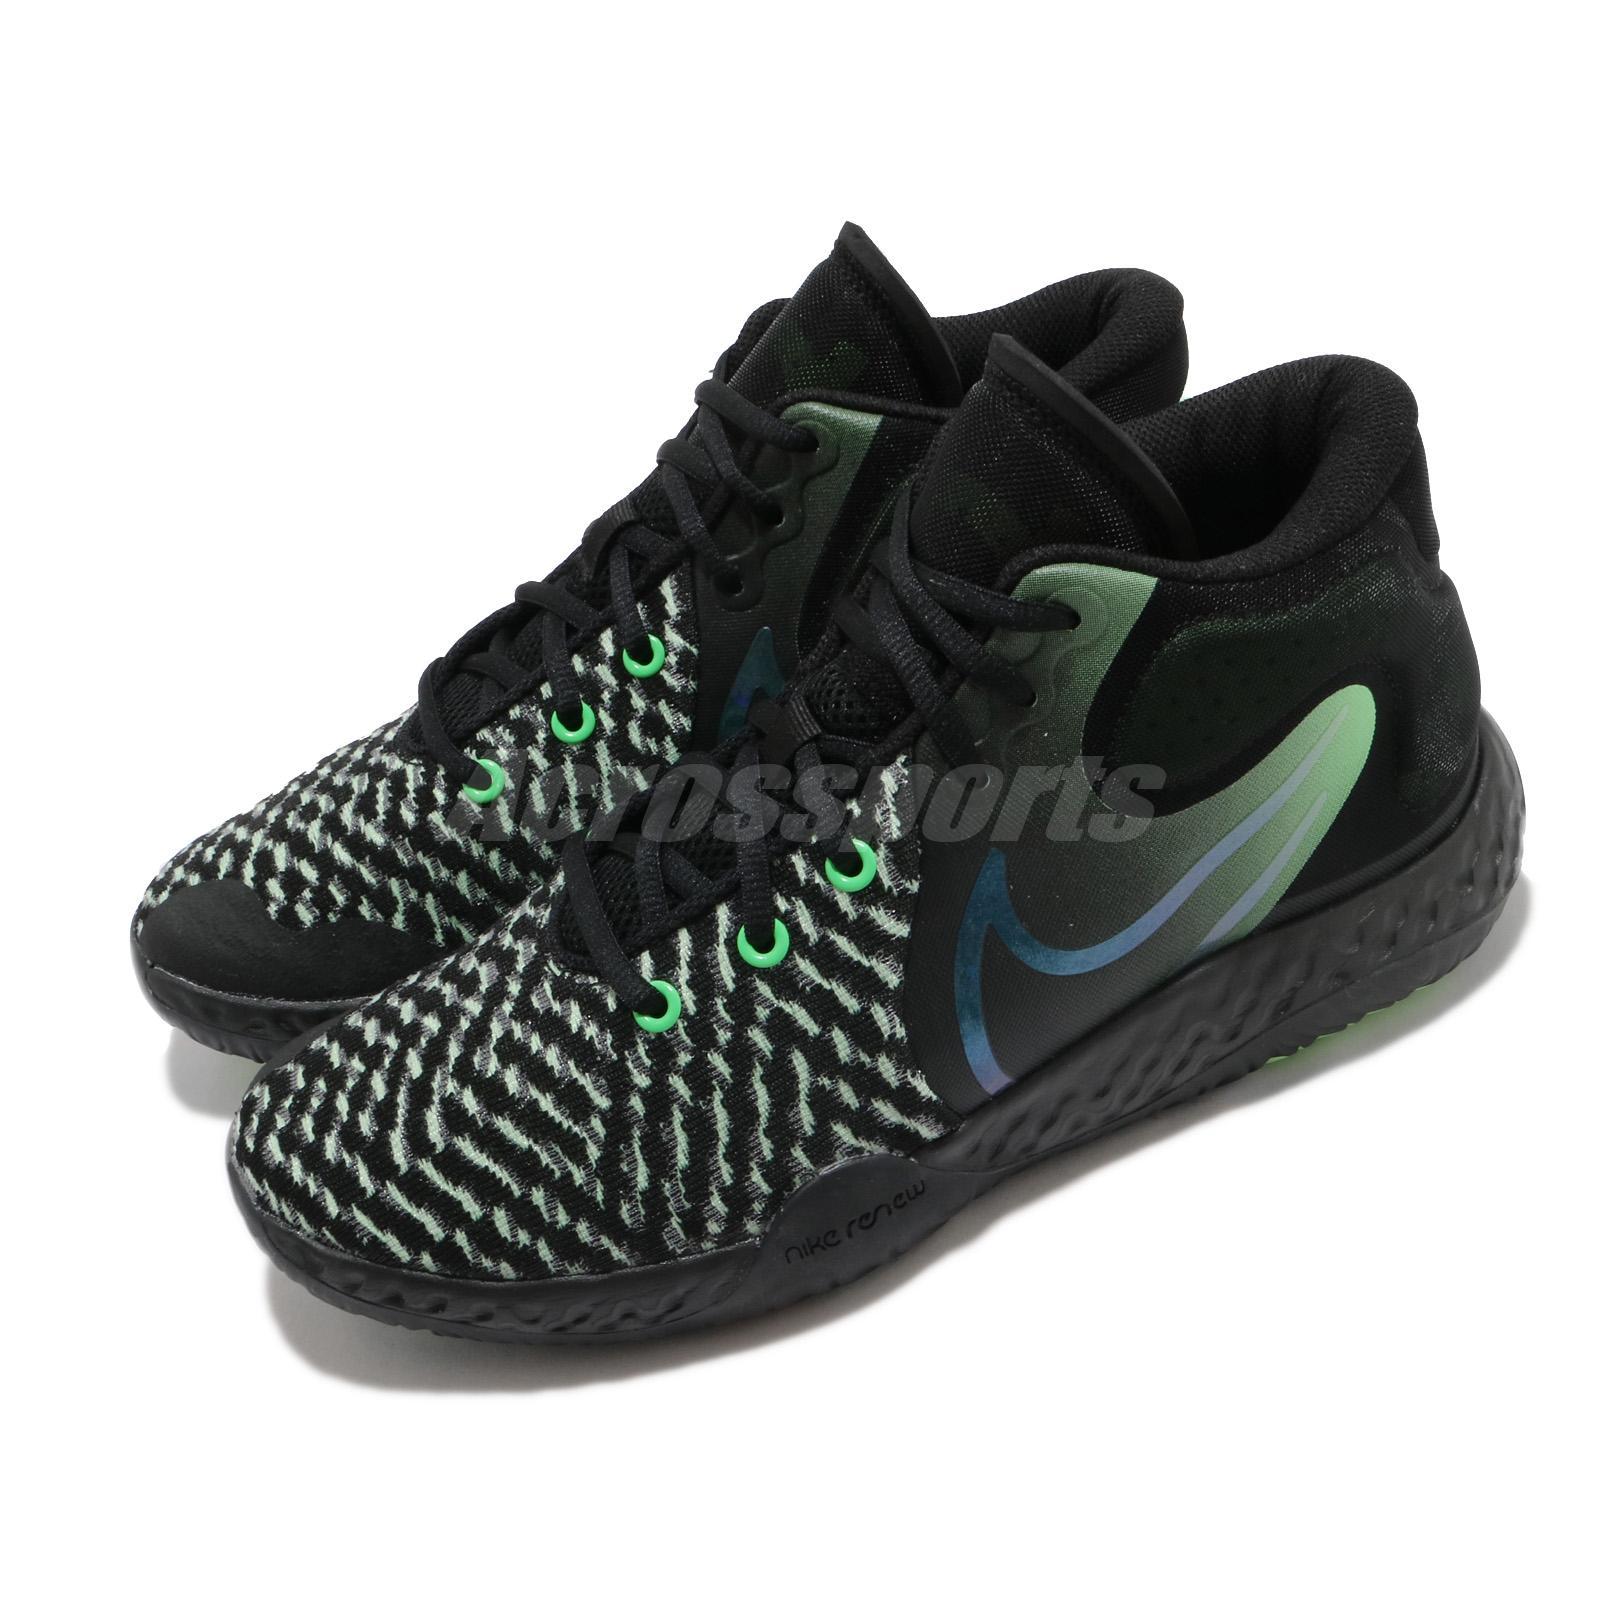 Nike KD Trey 5 VIII EP 8 Kevin Durant